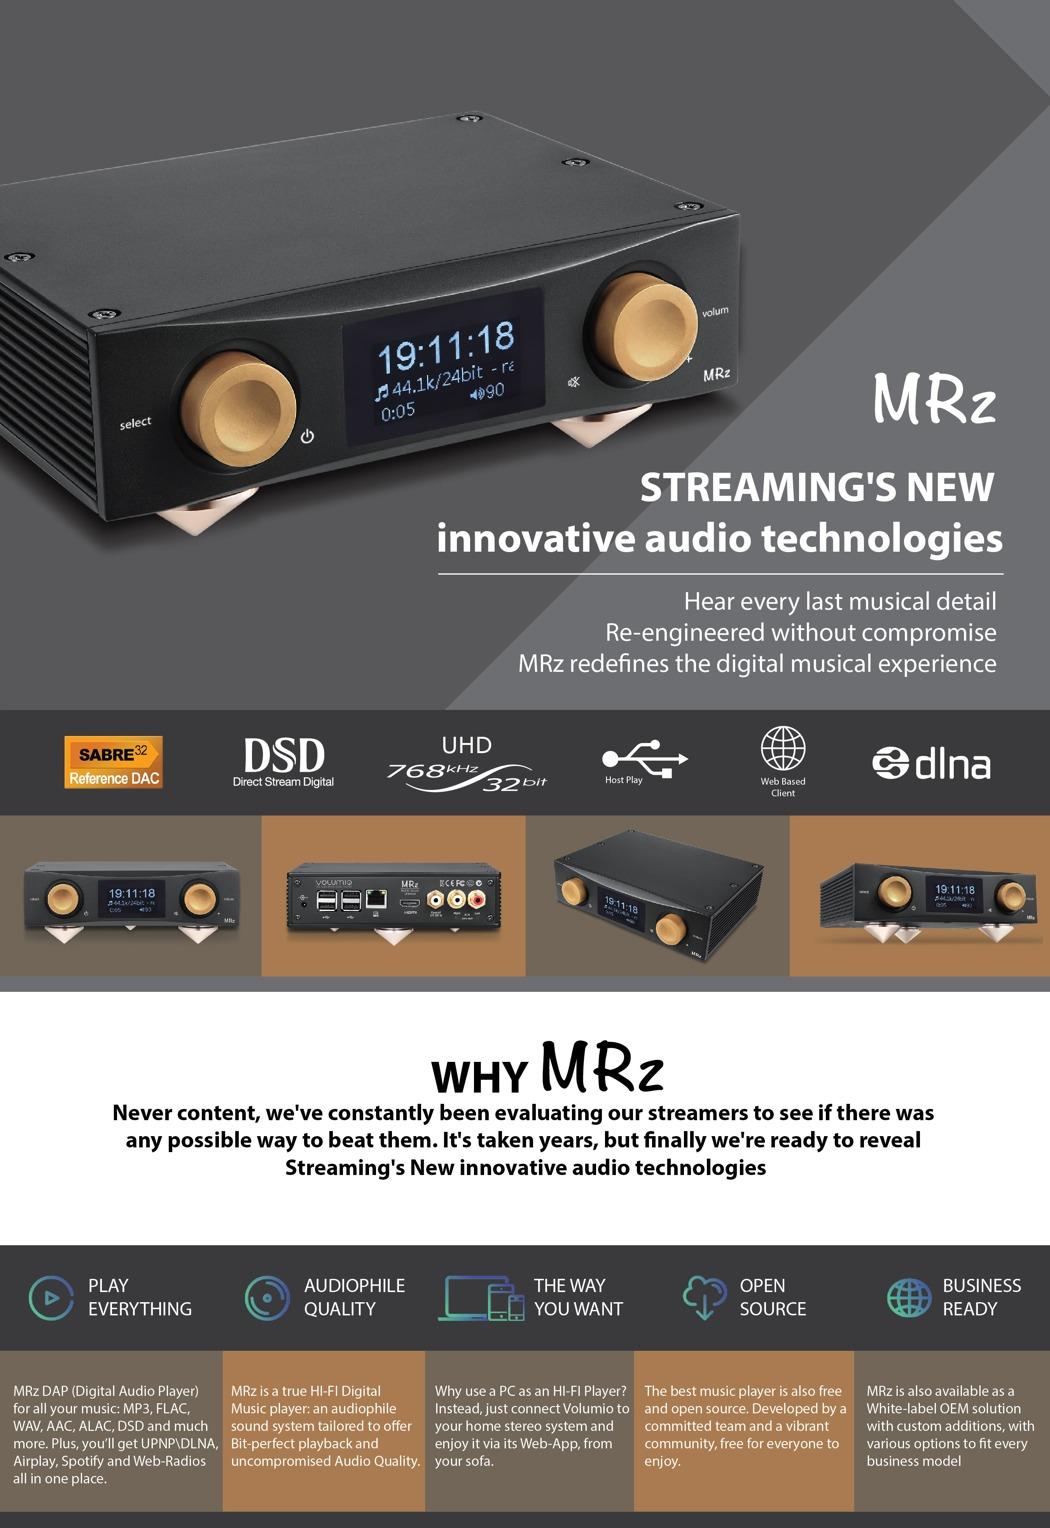 mrz_music_streaming_device_02